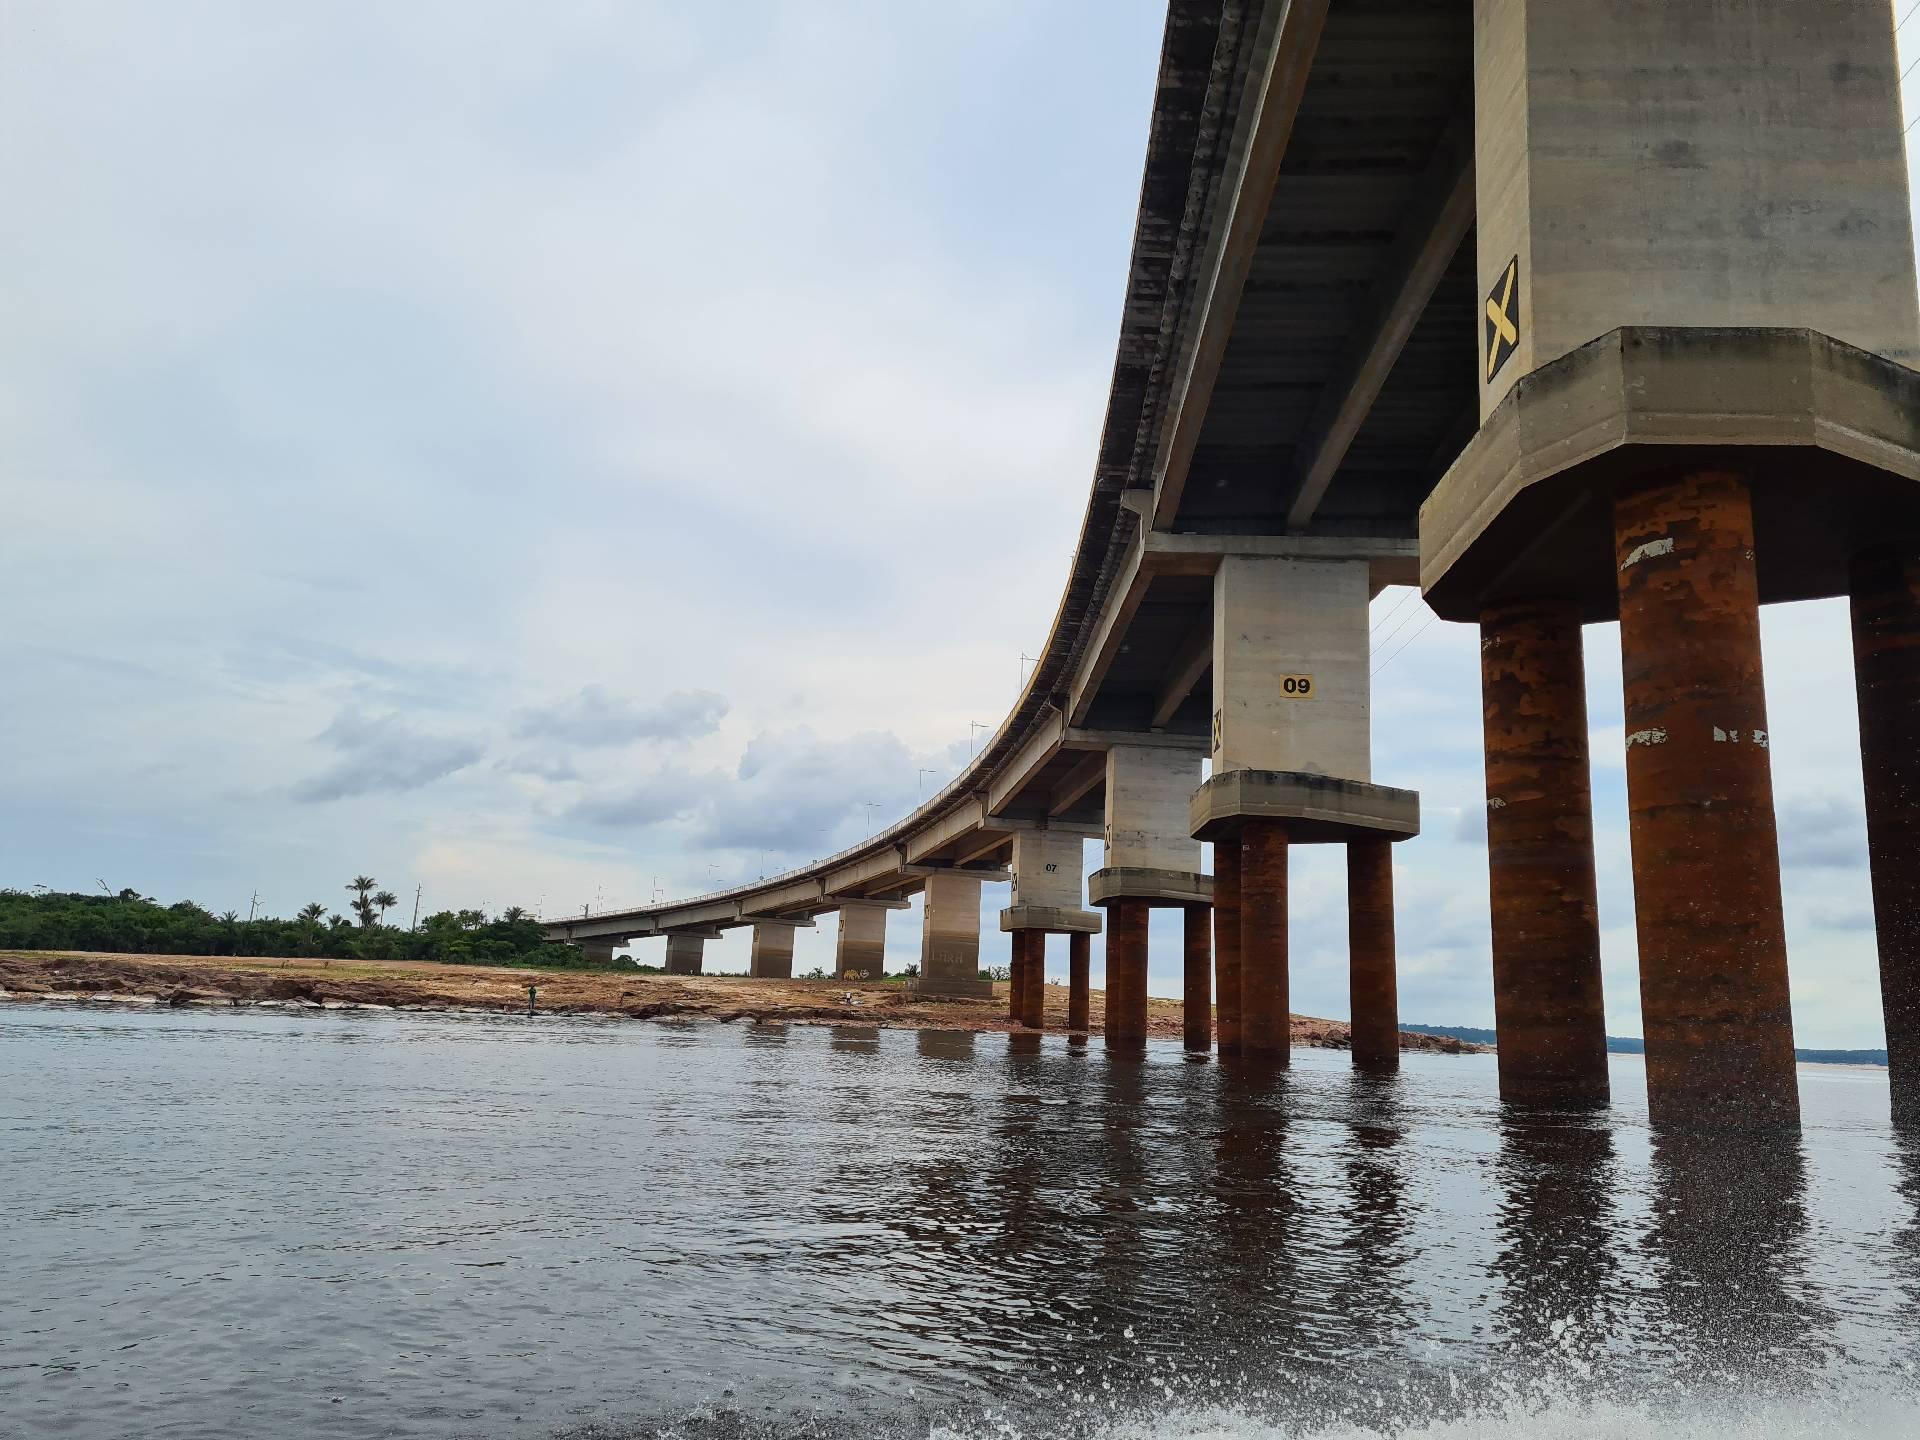 мост Манаус - Ирандубу через реку Риу-Негру